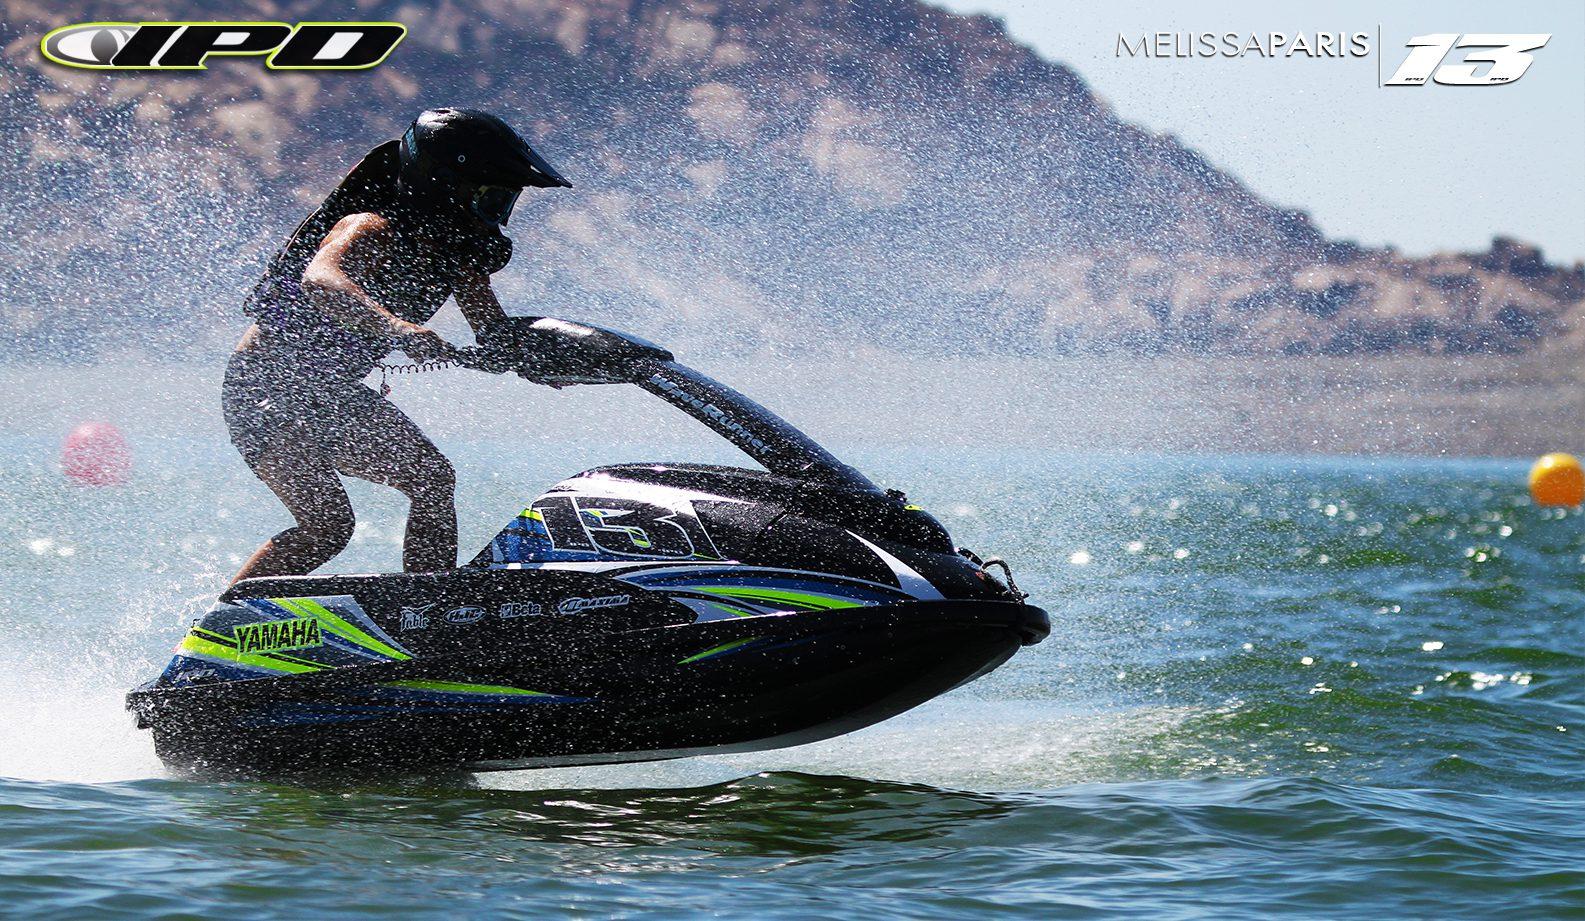 GK-JS2-SJ installed on Melissa Peris' Yamaha SuperJet